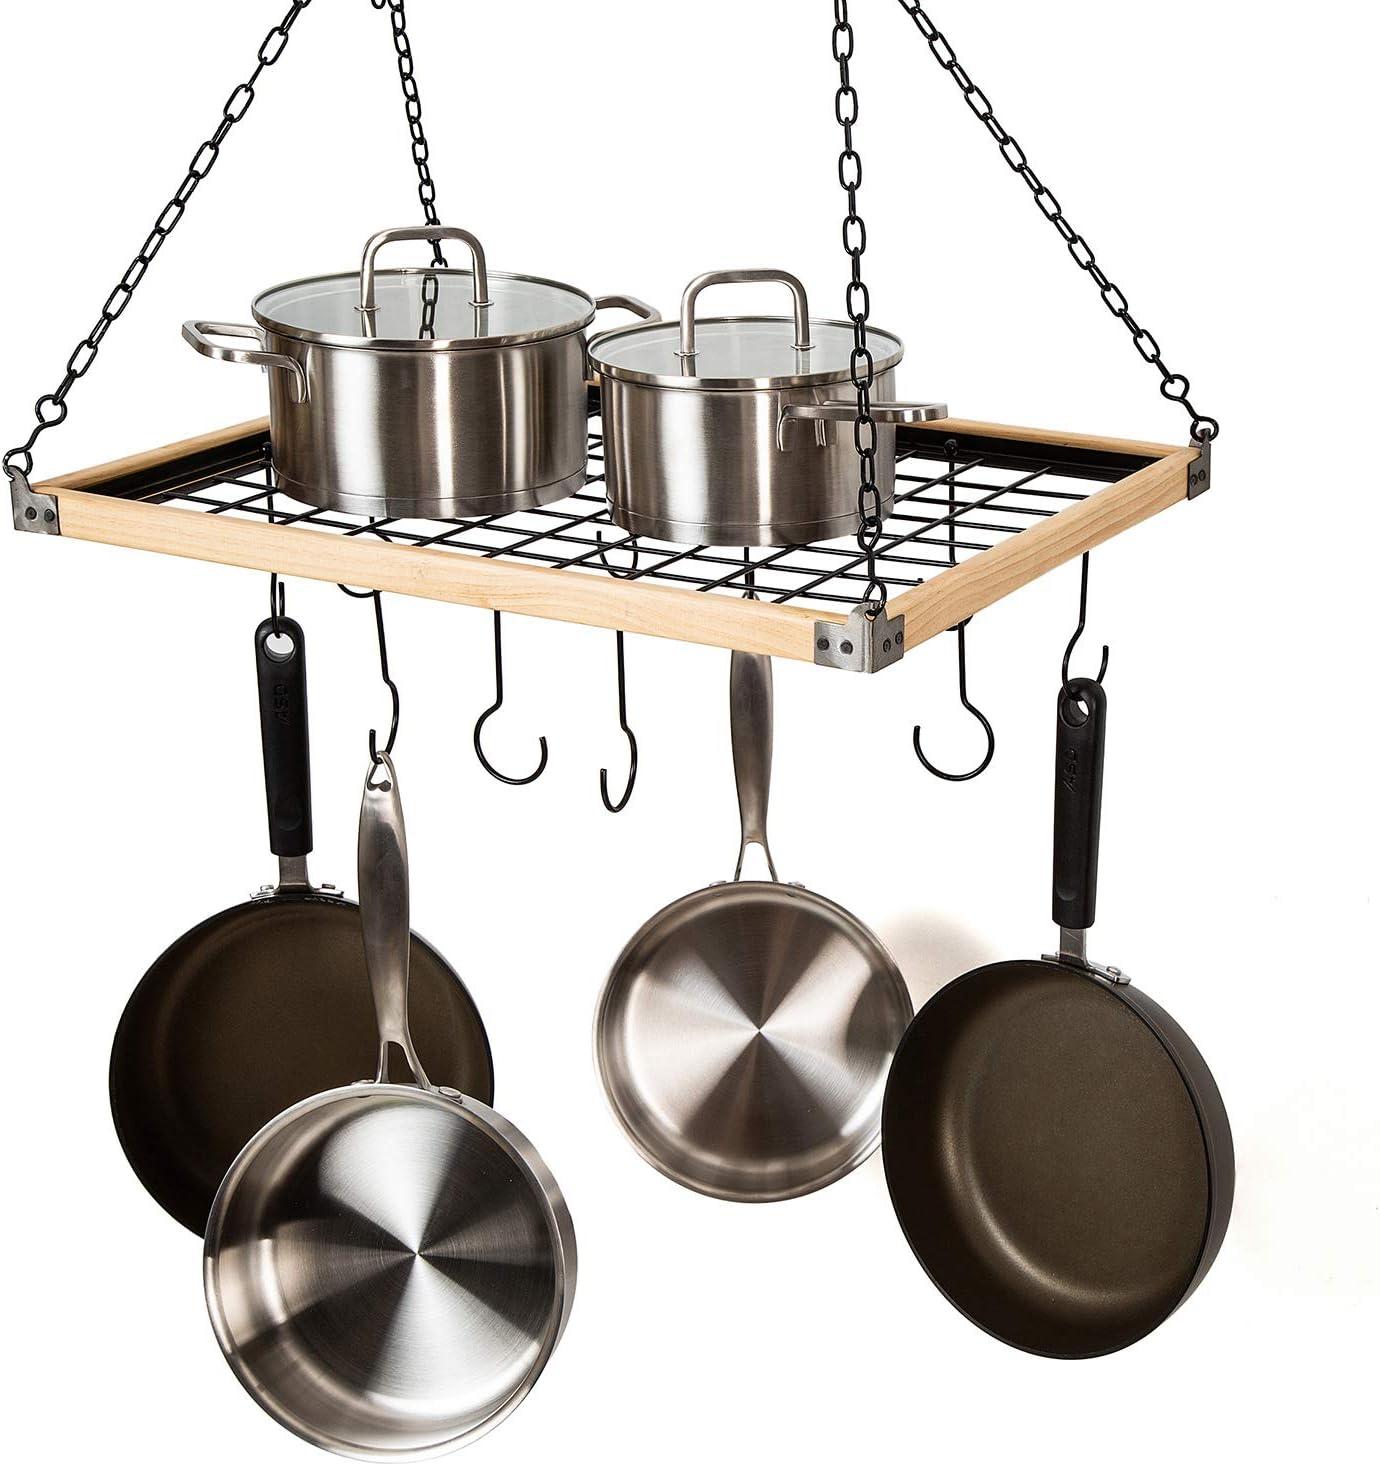 Stainless Steel Pots Pans Rack Kitchen Wall Storage Shelf Cookware Hanger Hooks